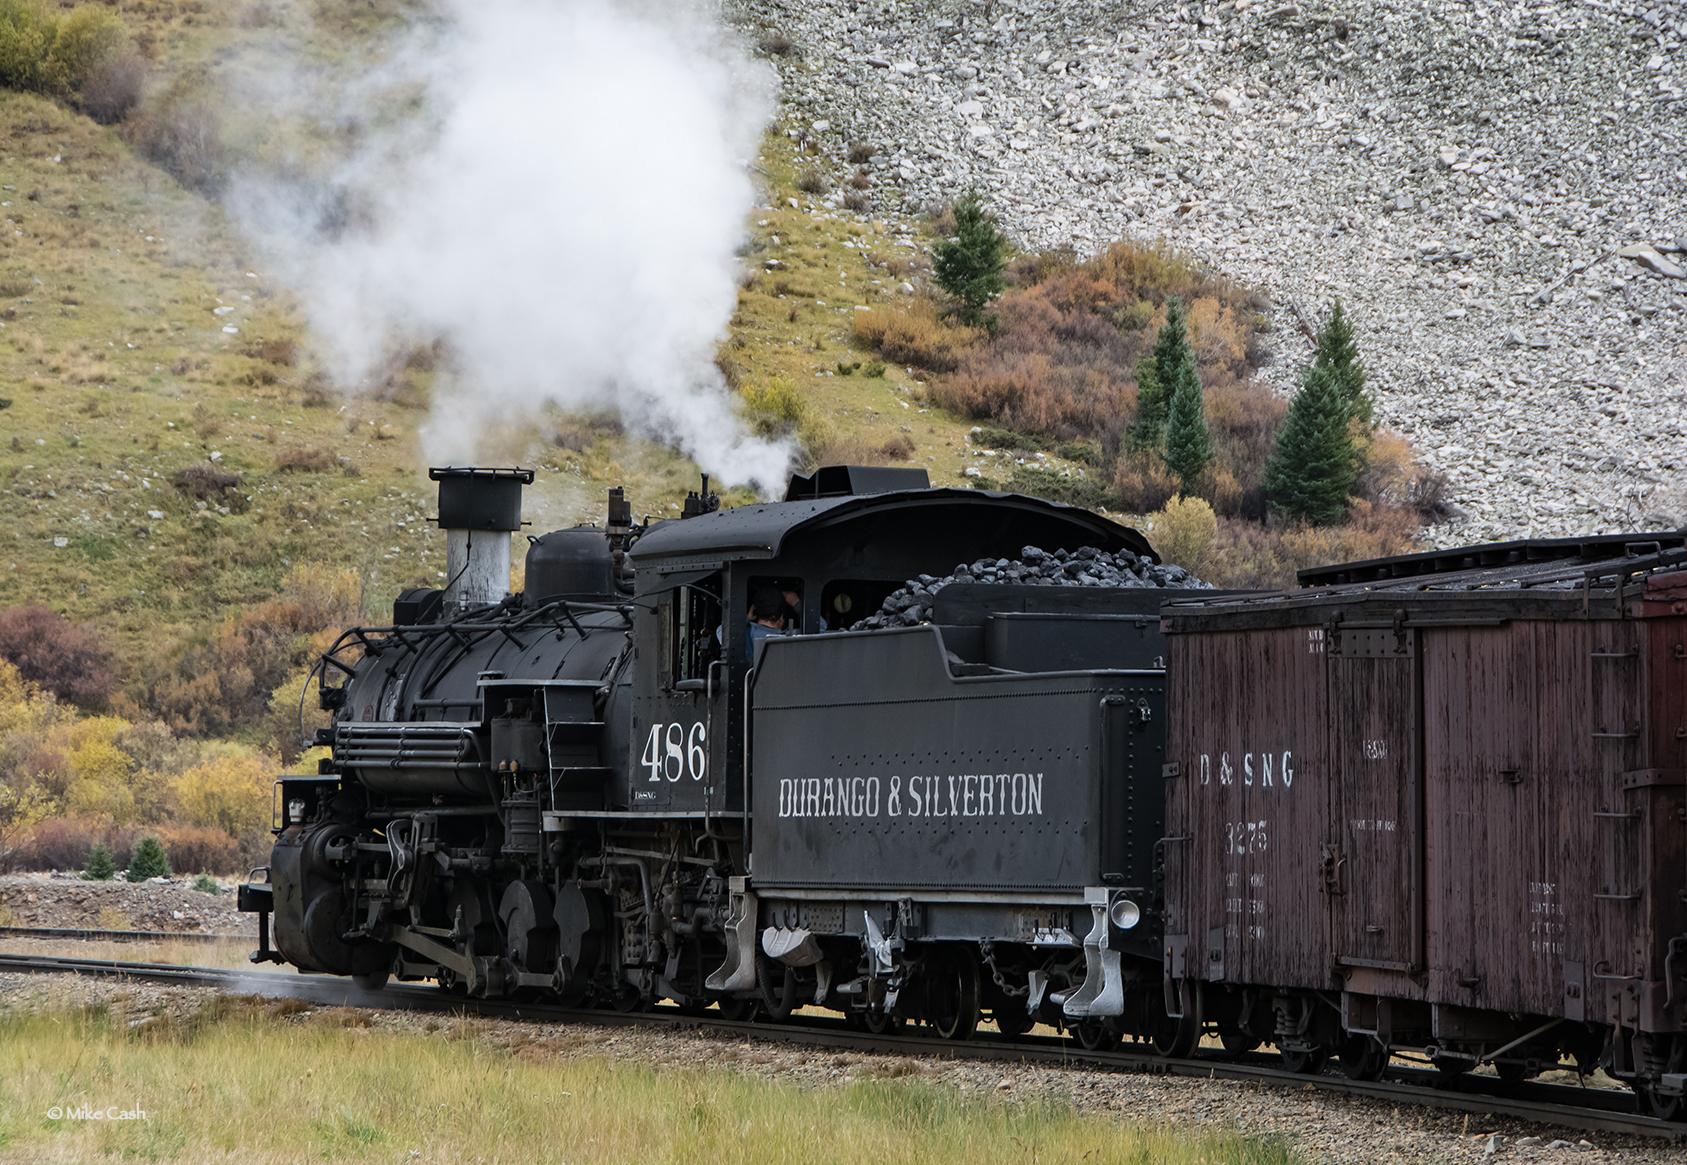 #486 backs onto the siding.